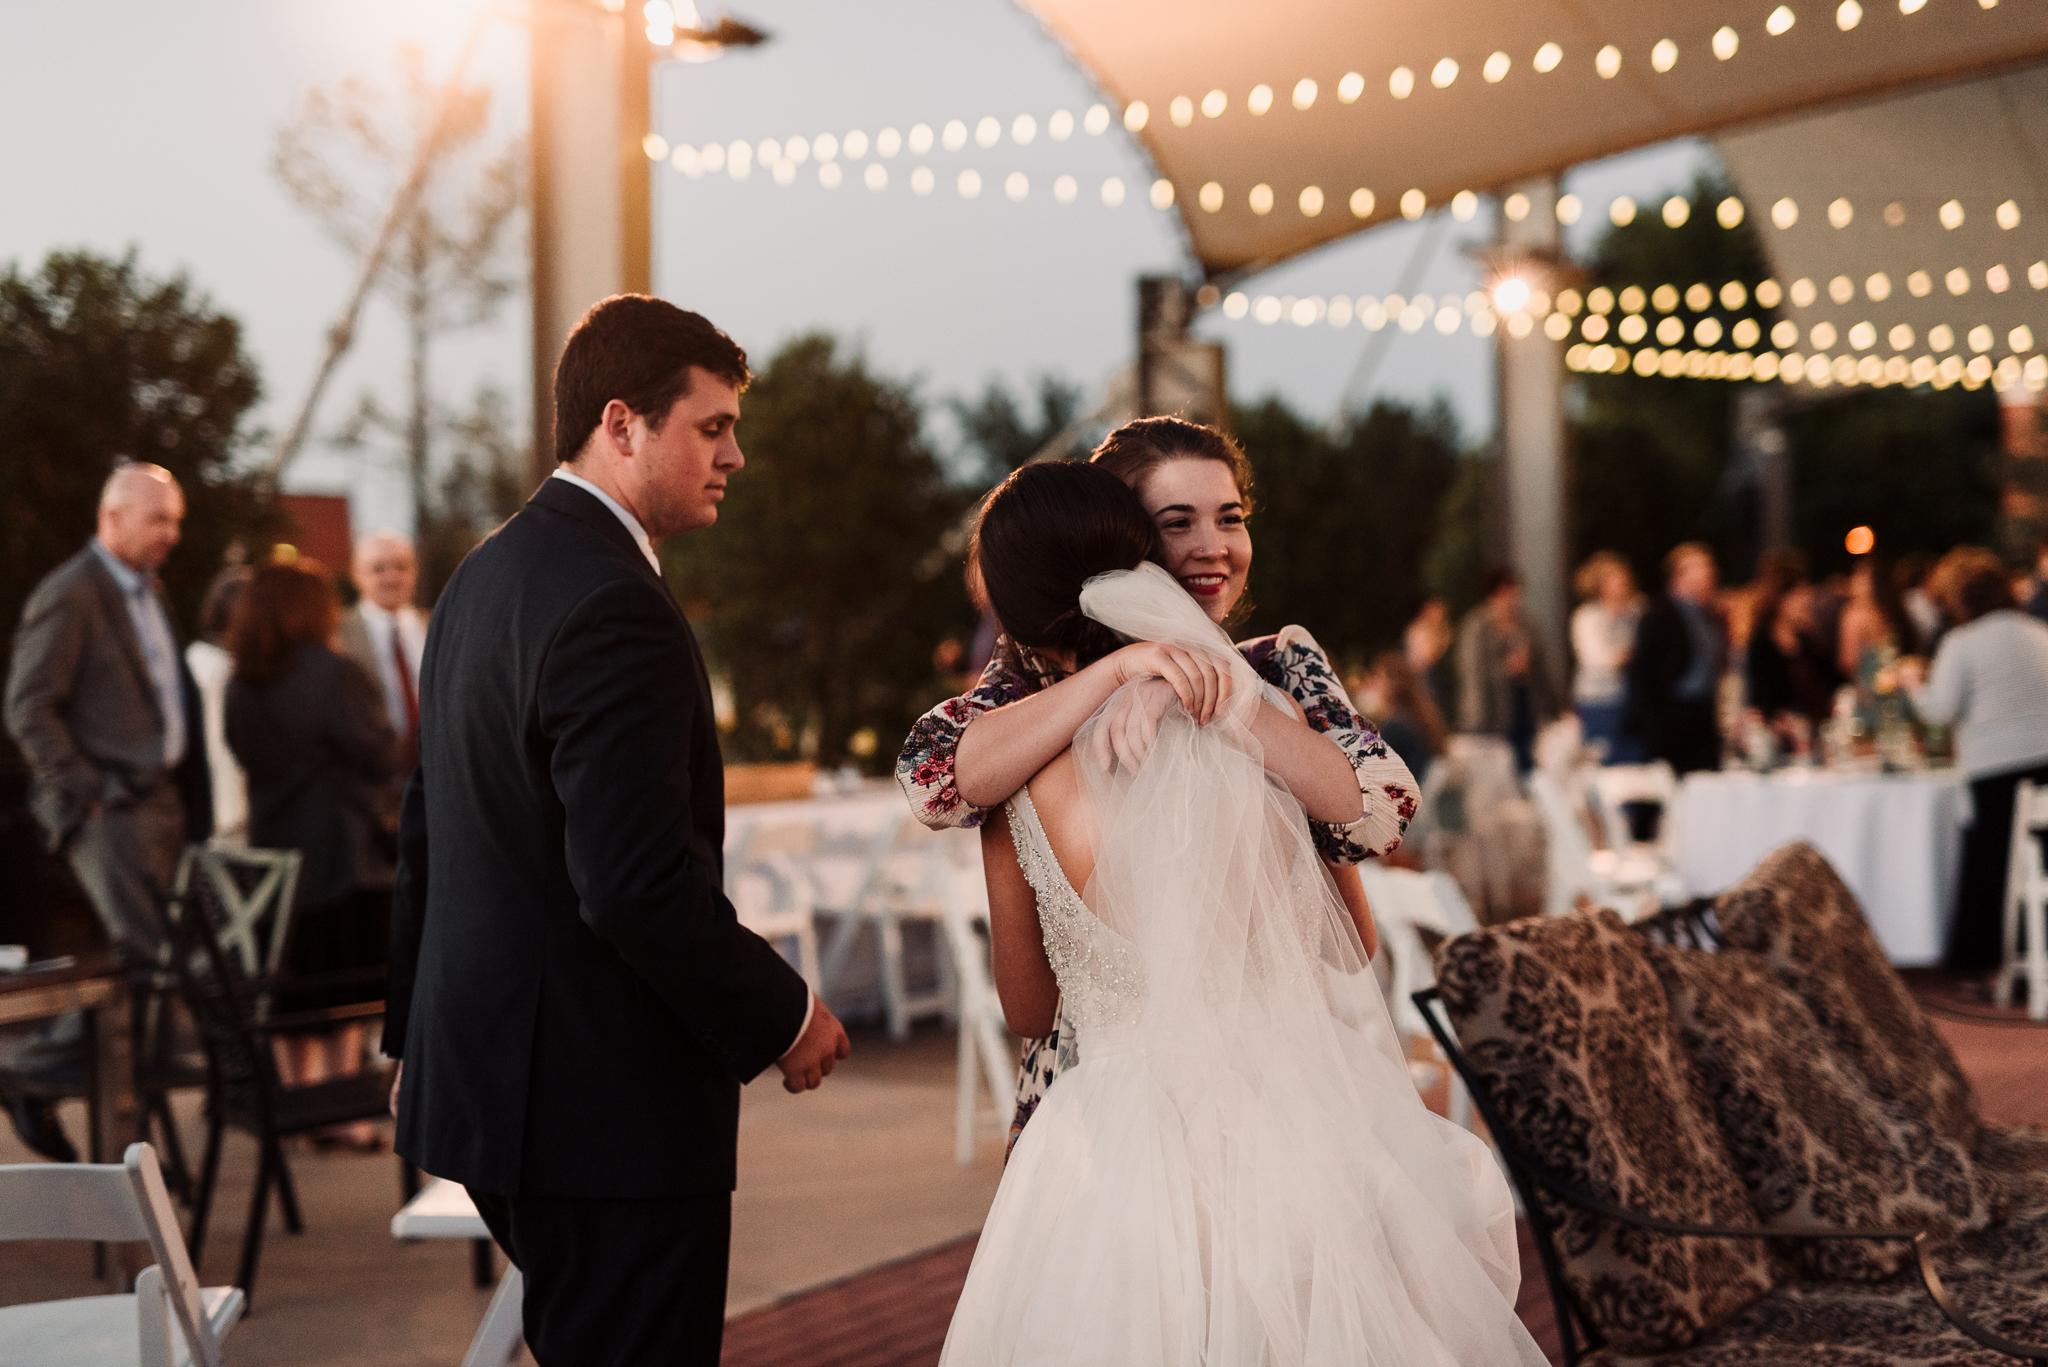 Oklahoma-Christian-University-Wedding-9363.jpg